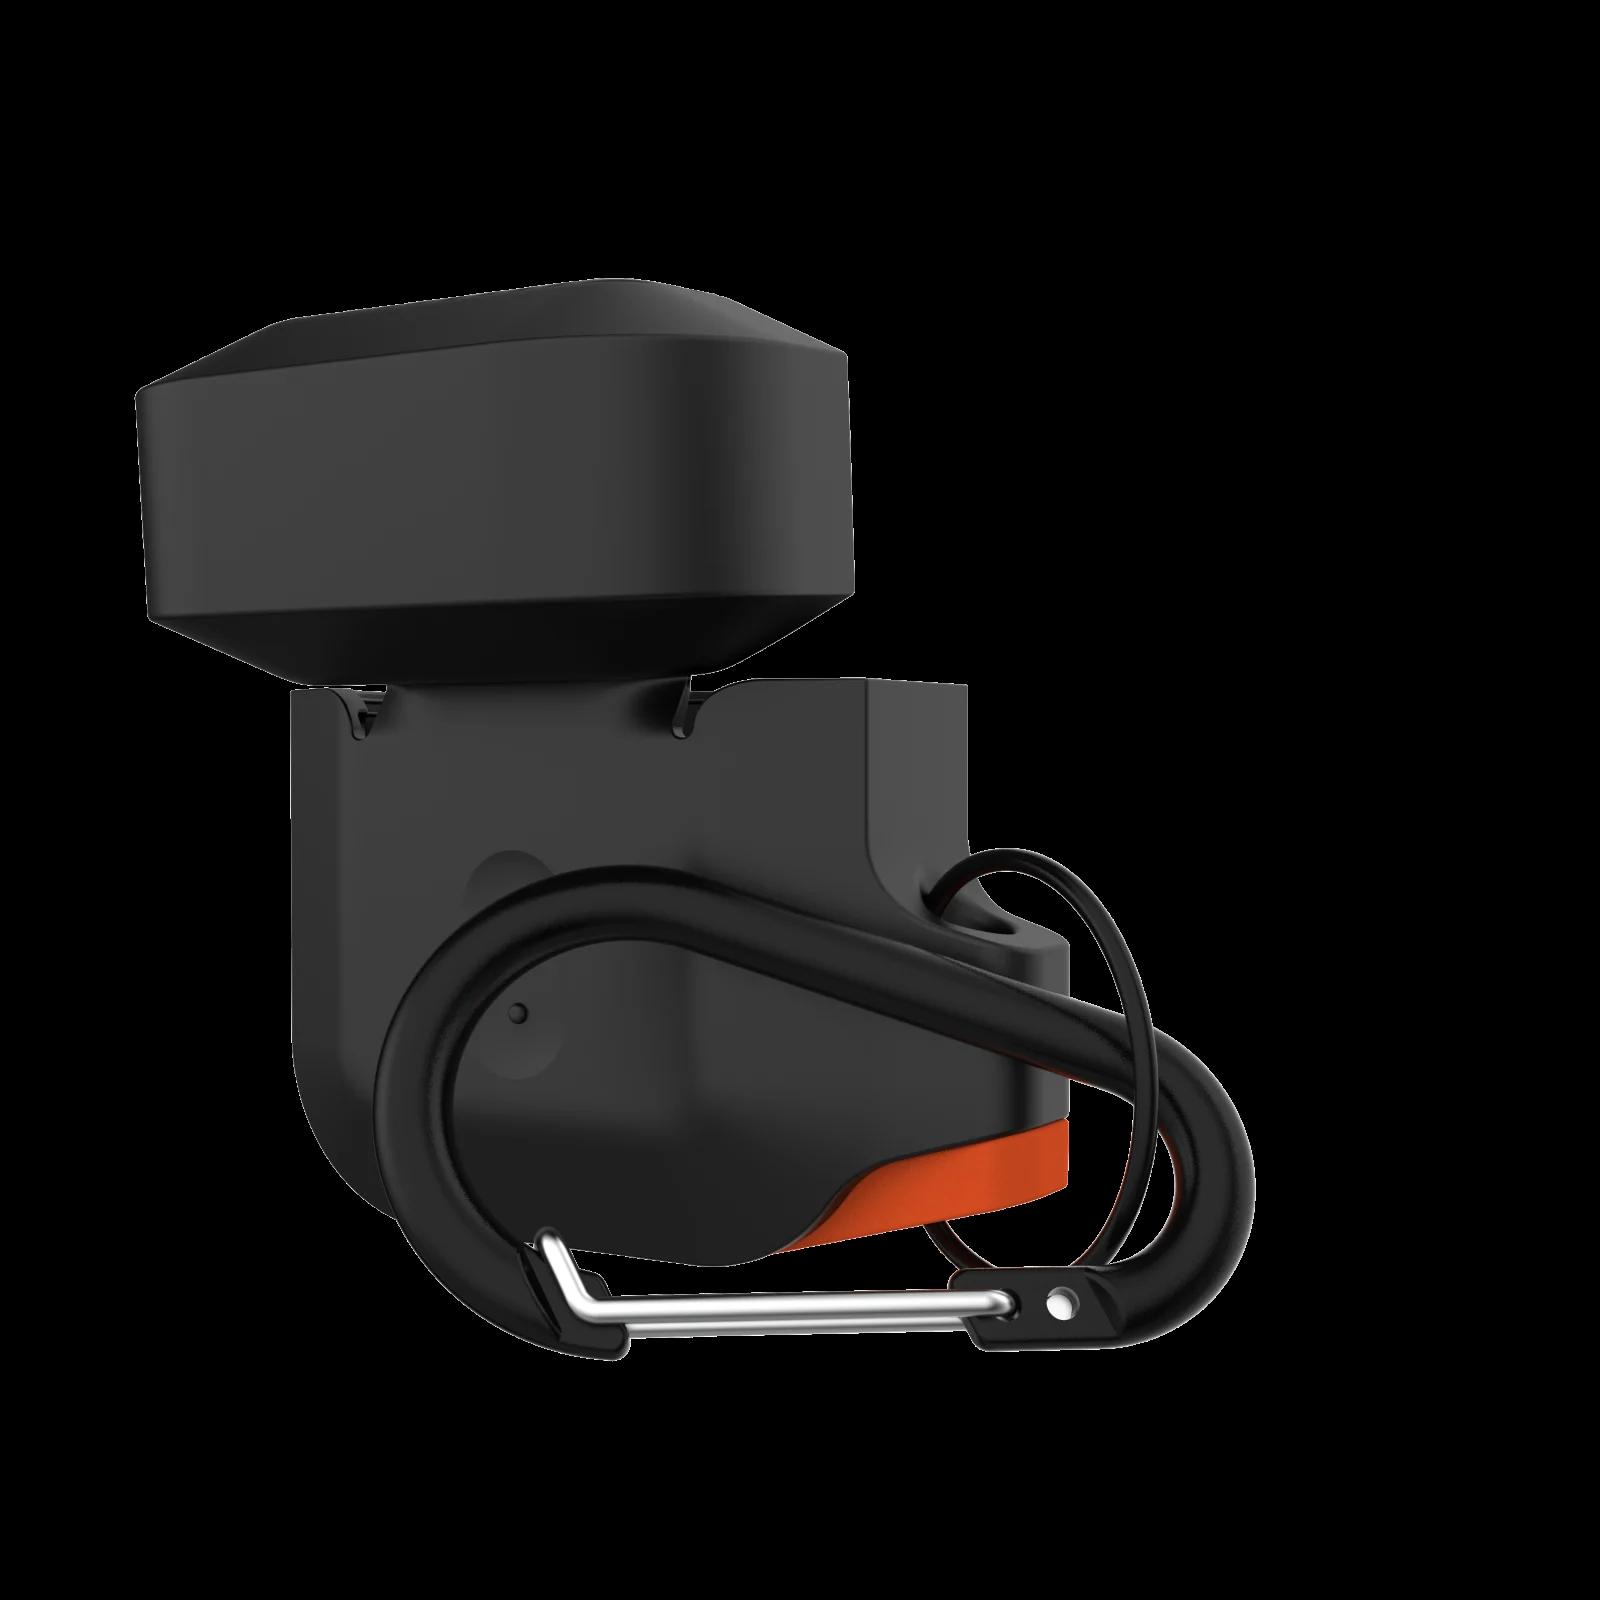 Apple Airpods 1st Gen 2nd Gen Airpods Pro Uag Silicone Case Original